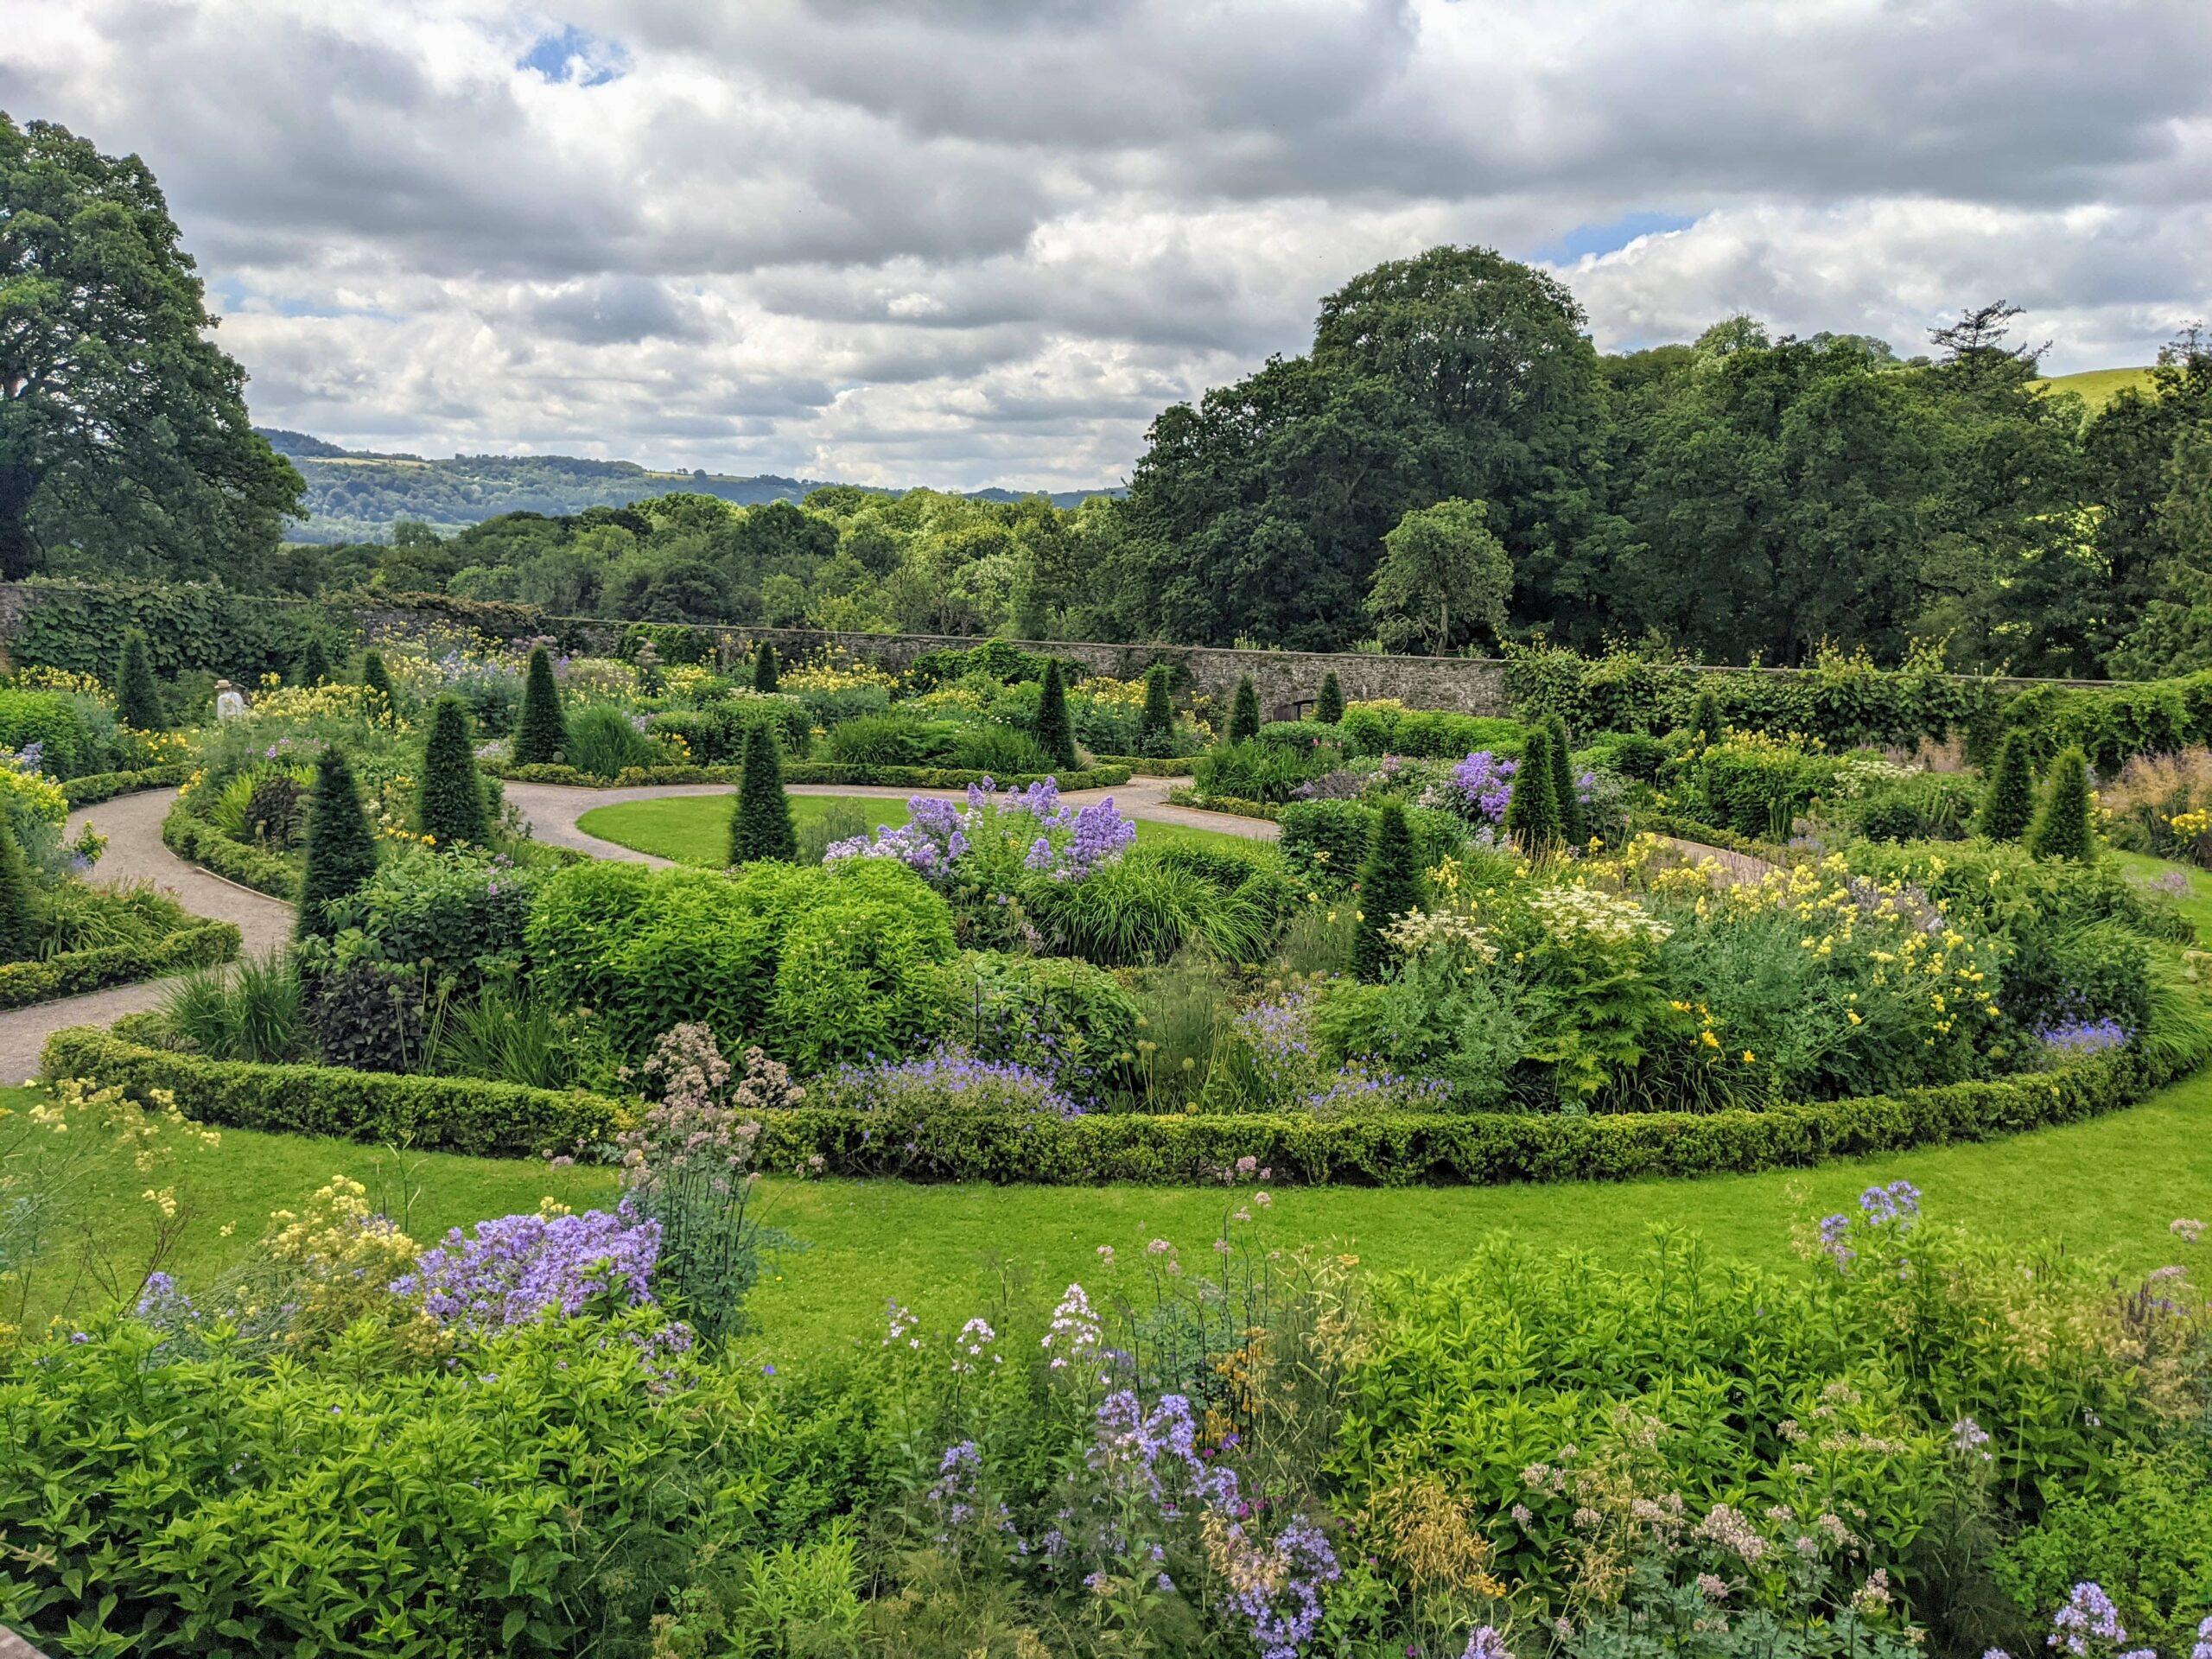 Aberglasney Gardens Courtyard Lawn